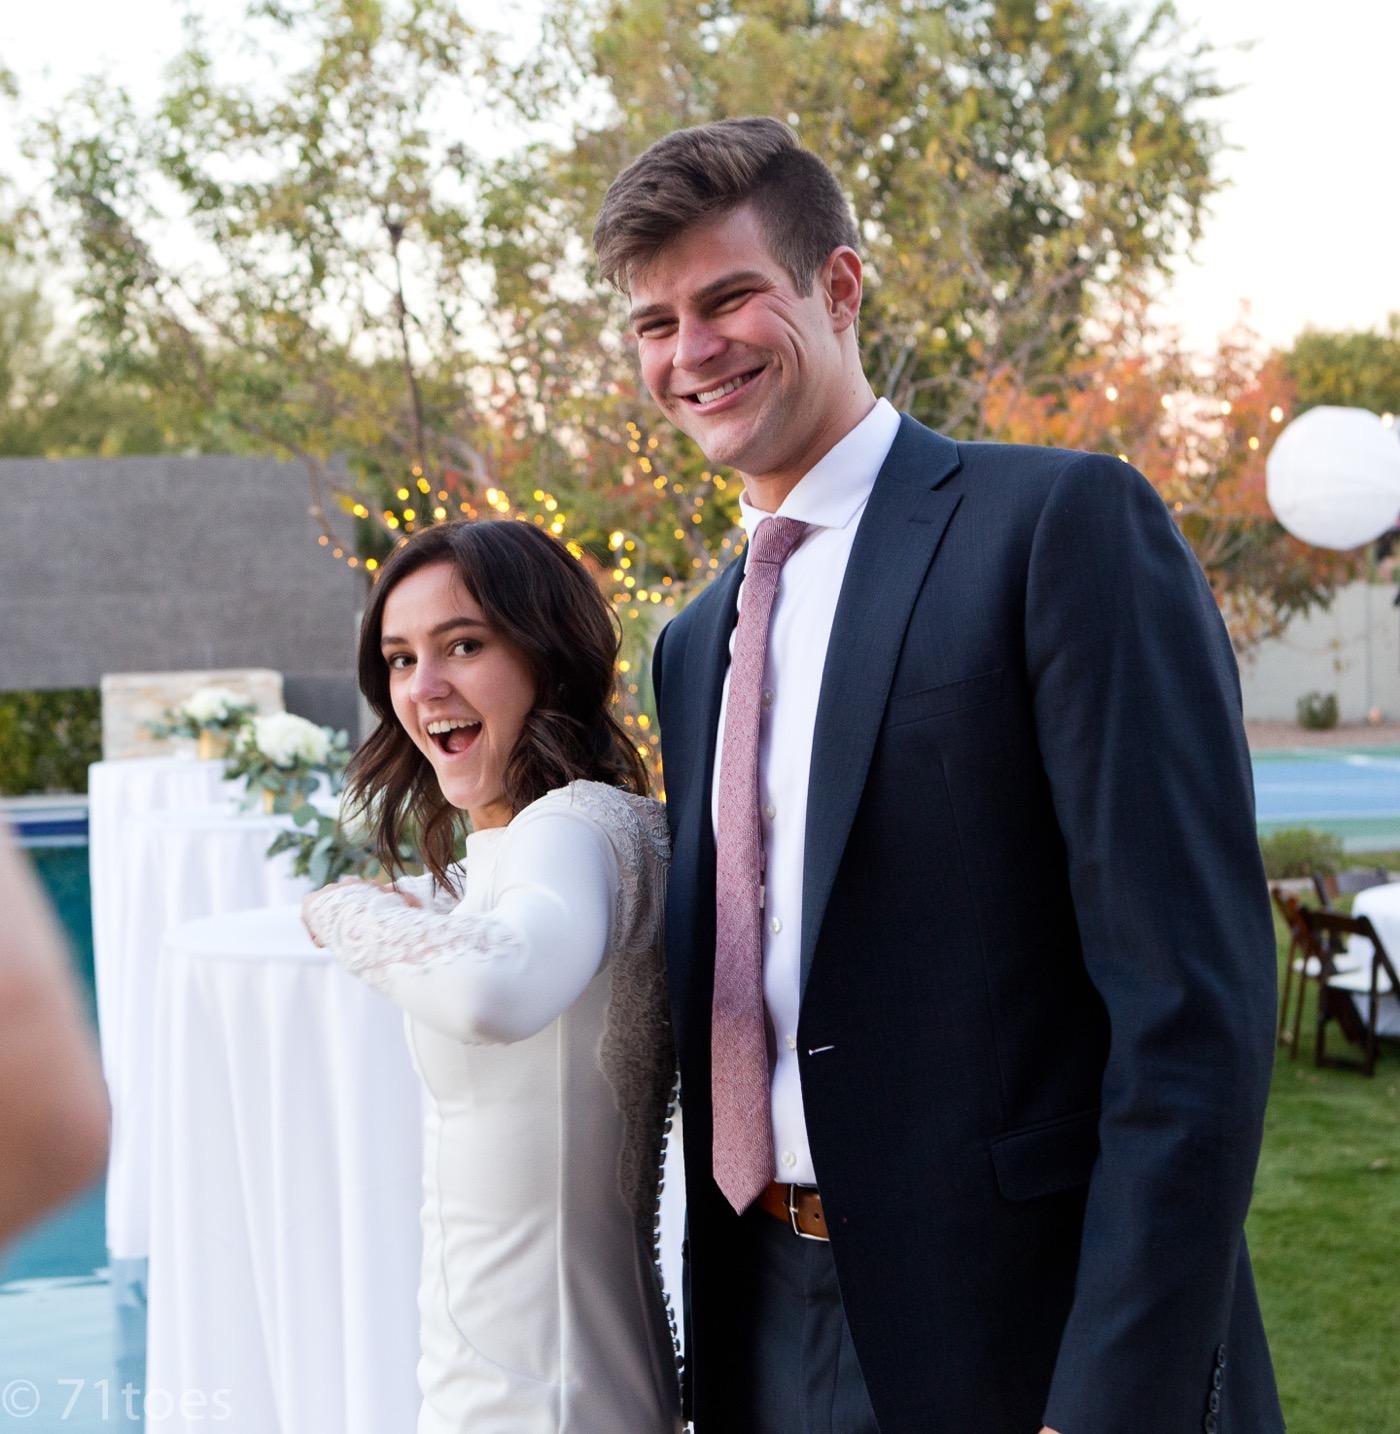 2018 12 20 Max s wedding 210689